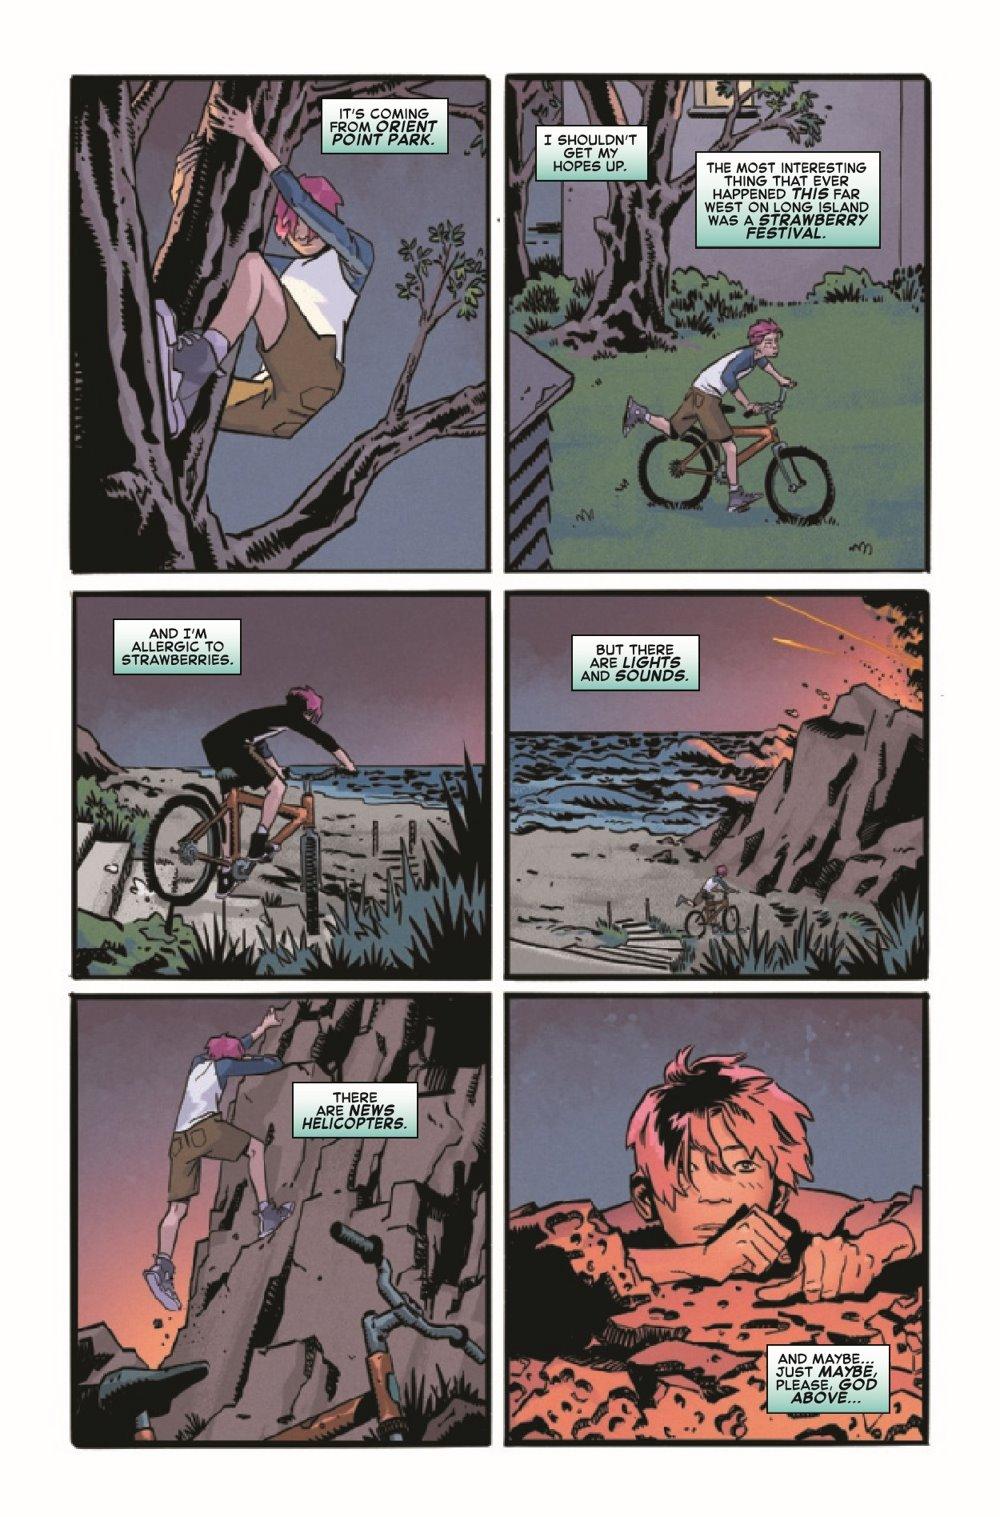 CAPMARVSNAP2020001_Preview-4 ComicList Previews: CAPTAIN MARVEL MARVELS SNAPSHOTS #1